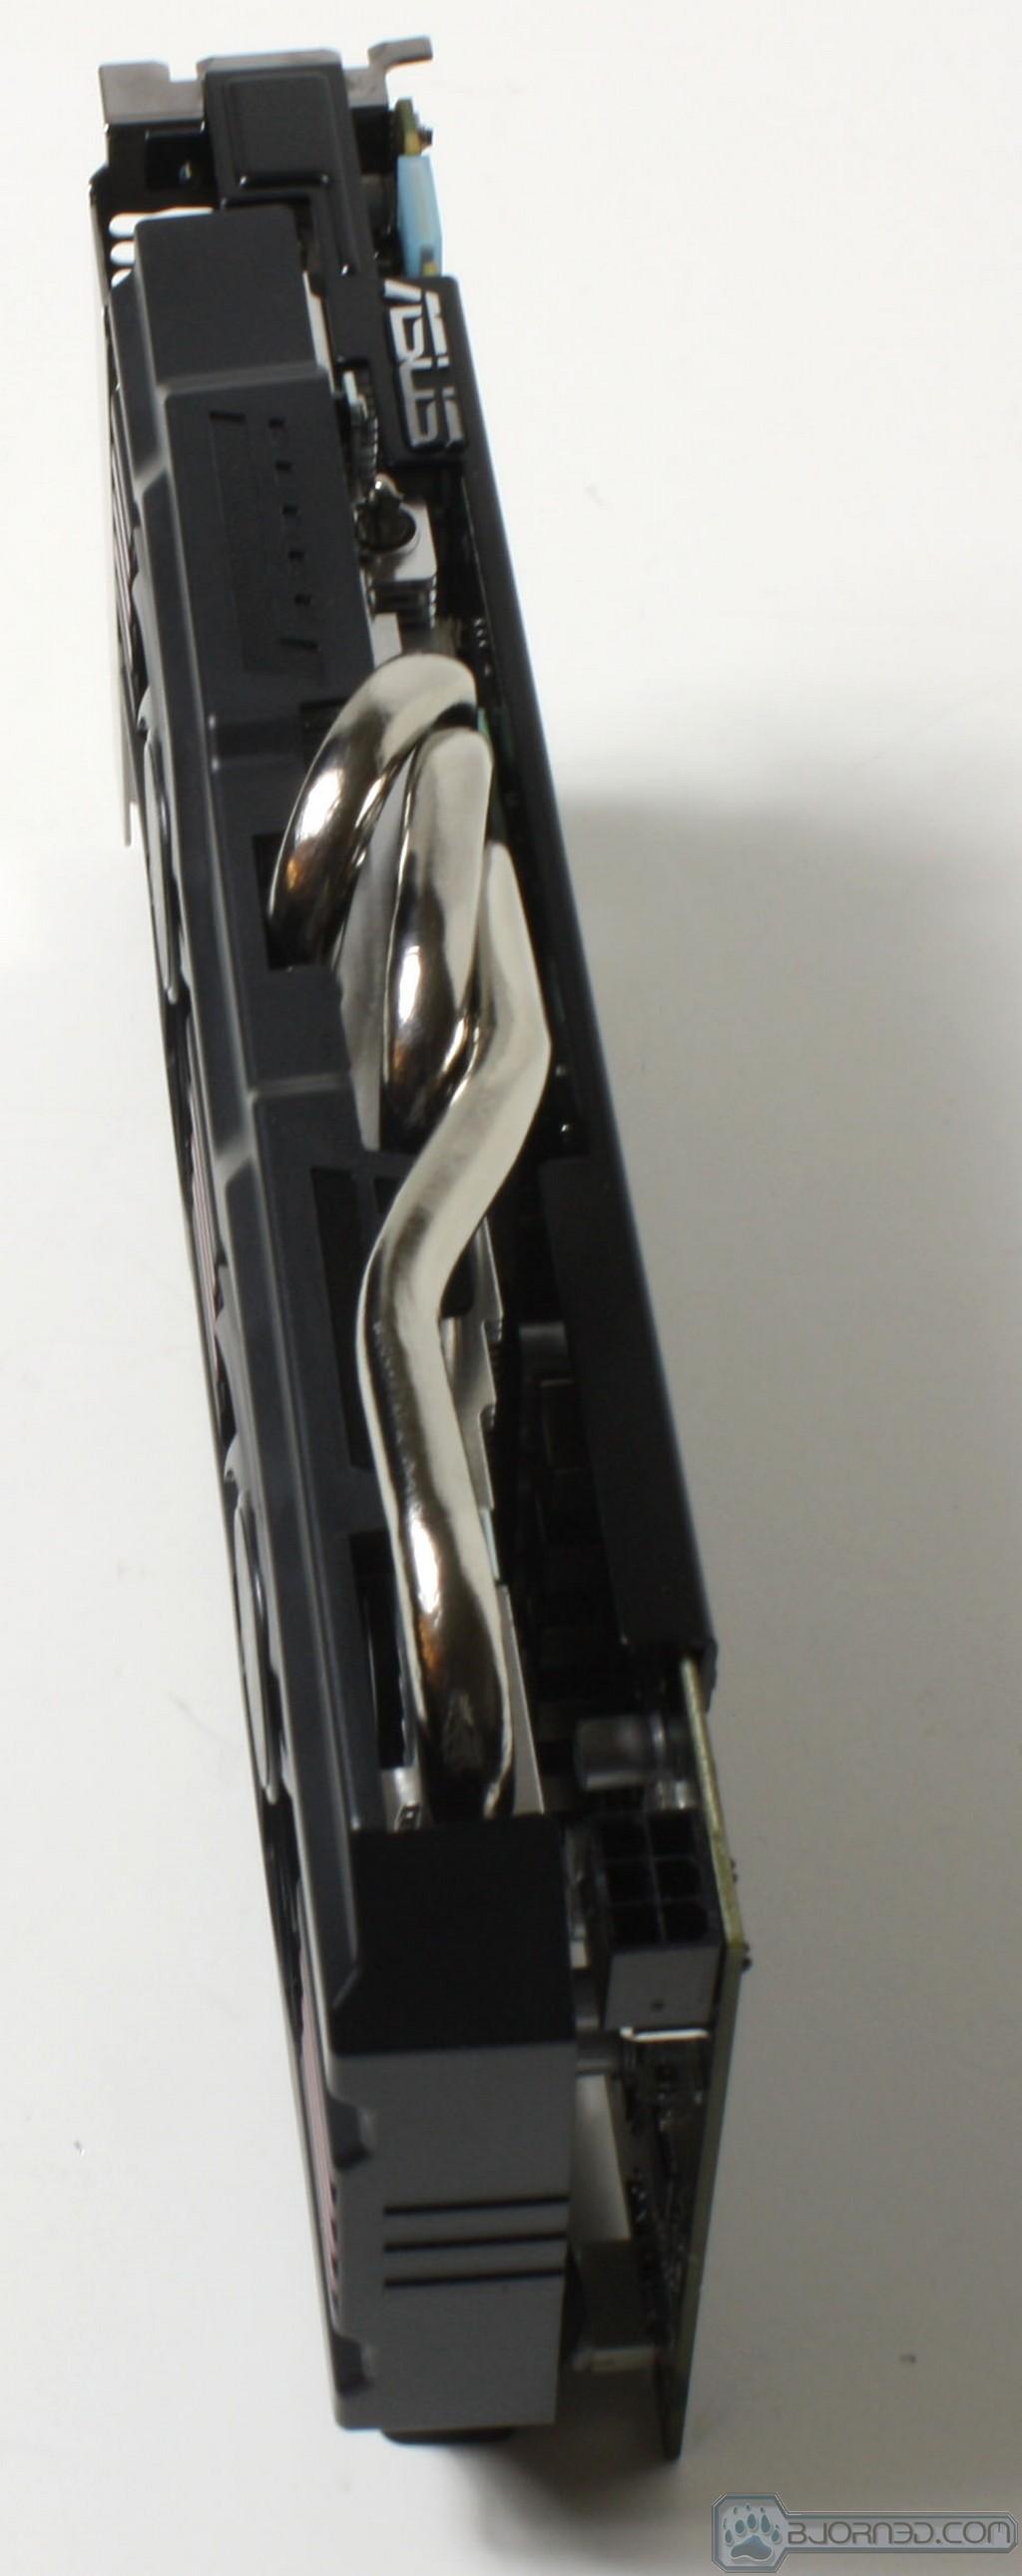 ASUS GTX 660 7